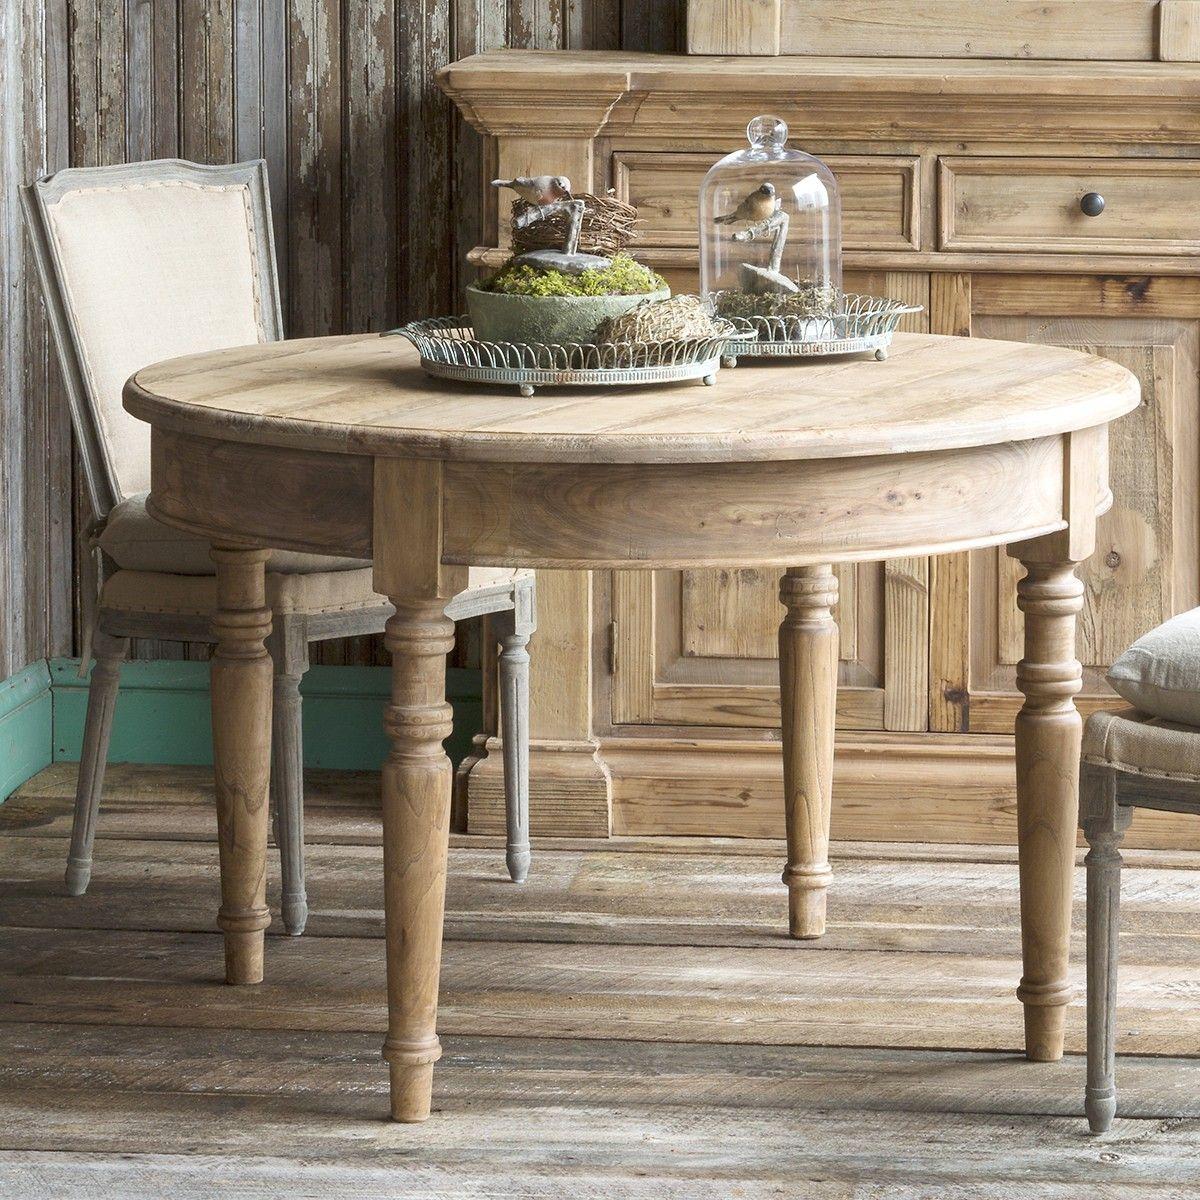 rustic round dining table  rustic round dining table